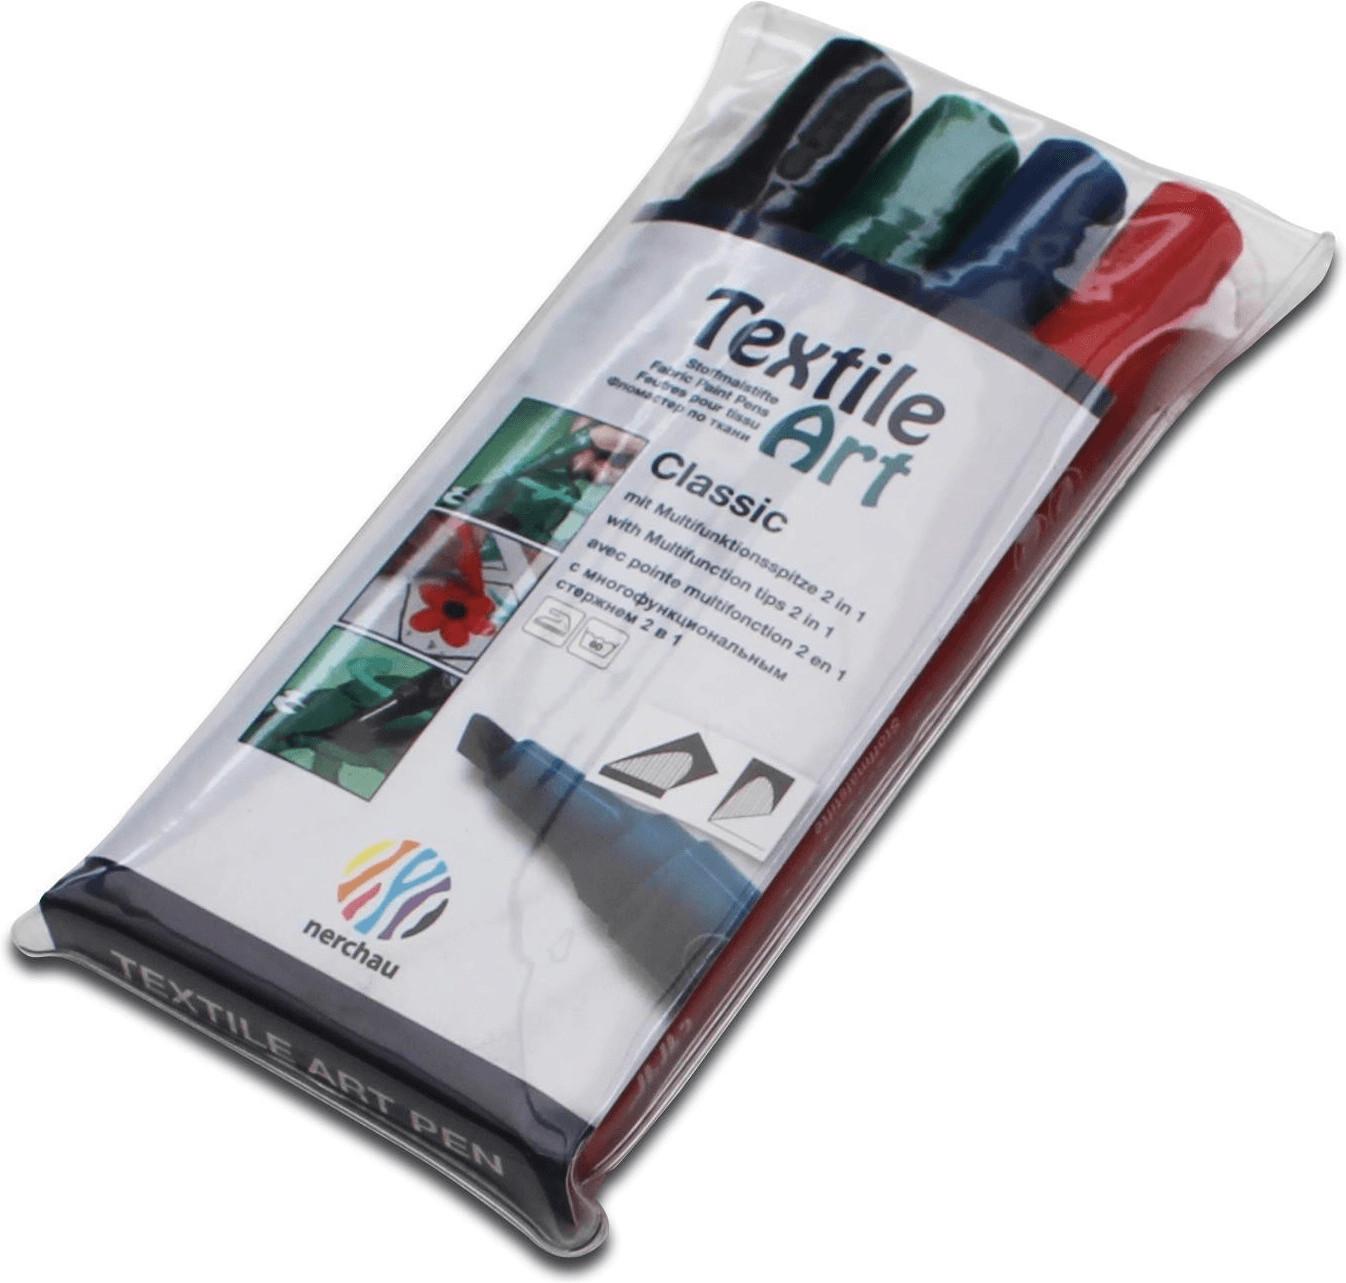 Nerchau Textile Art Stoffmalstifte 4er-Set (140400)